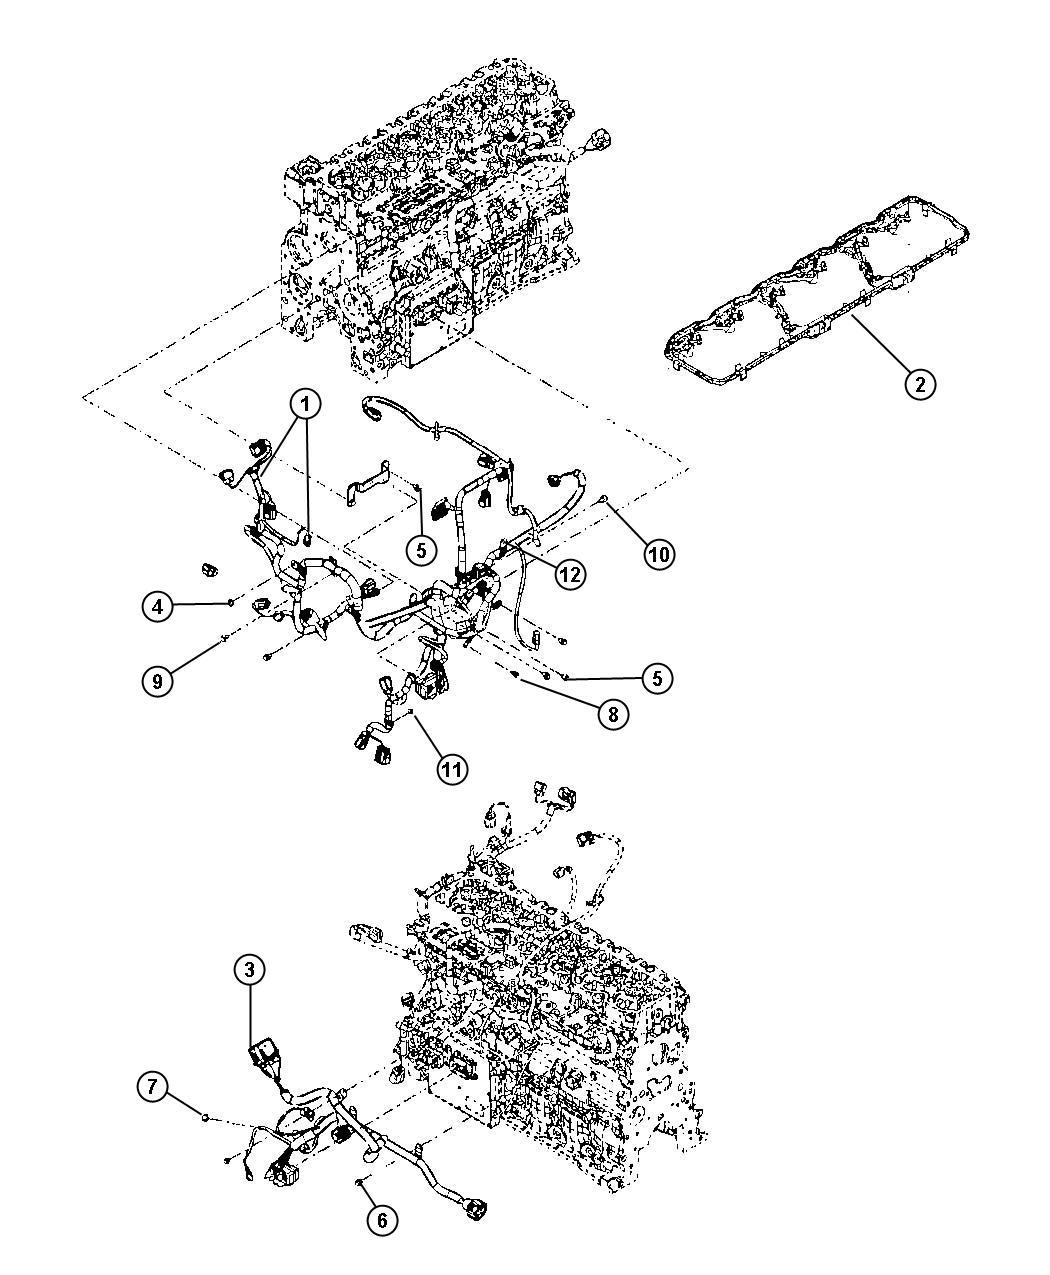 Dodge Ram 3500 Wiring. Engine. [export emissions], stamped